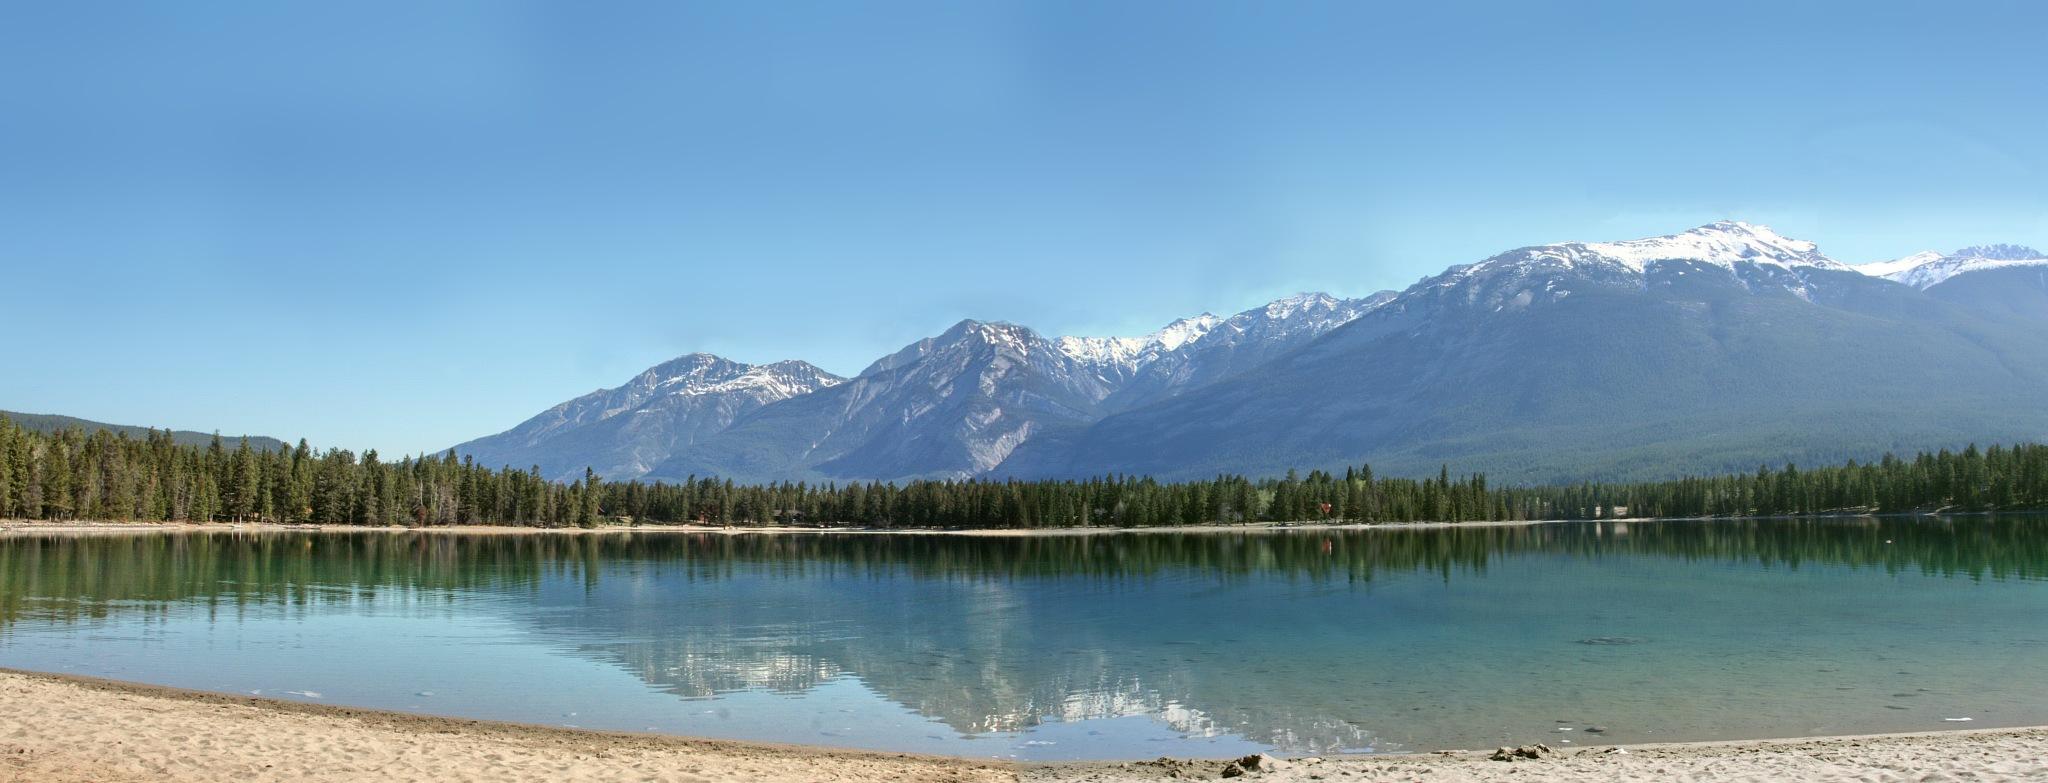 Lake Edith by yatwing